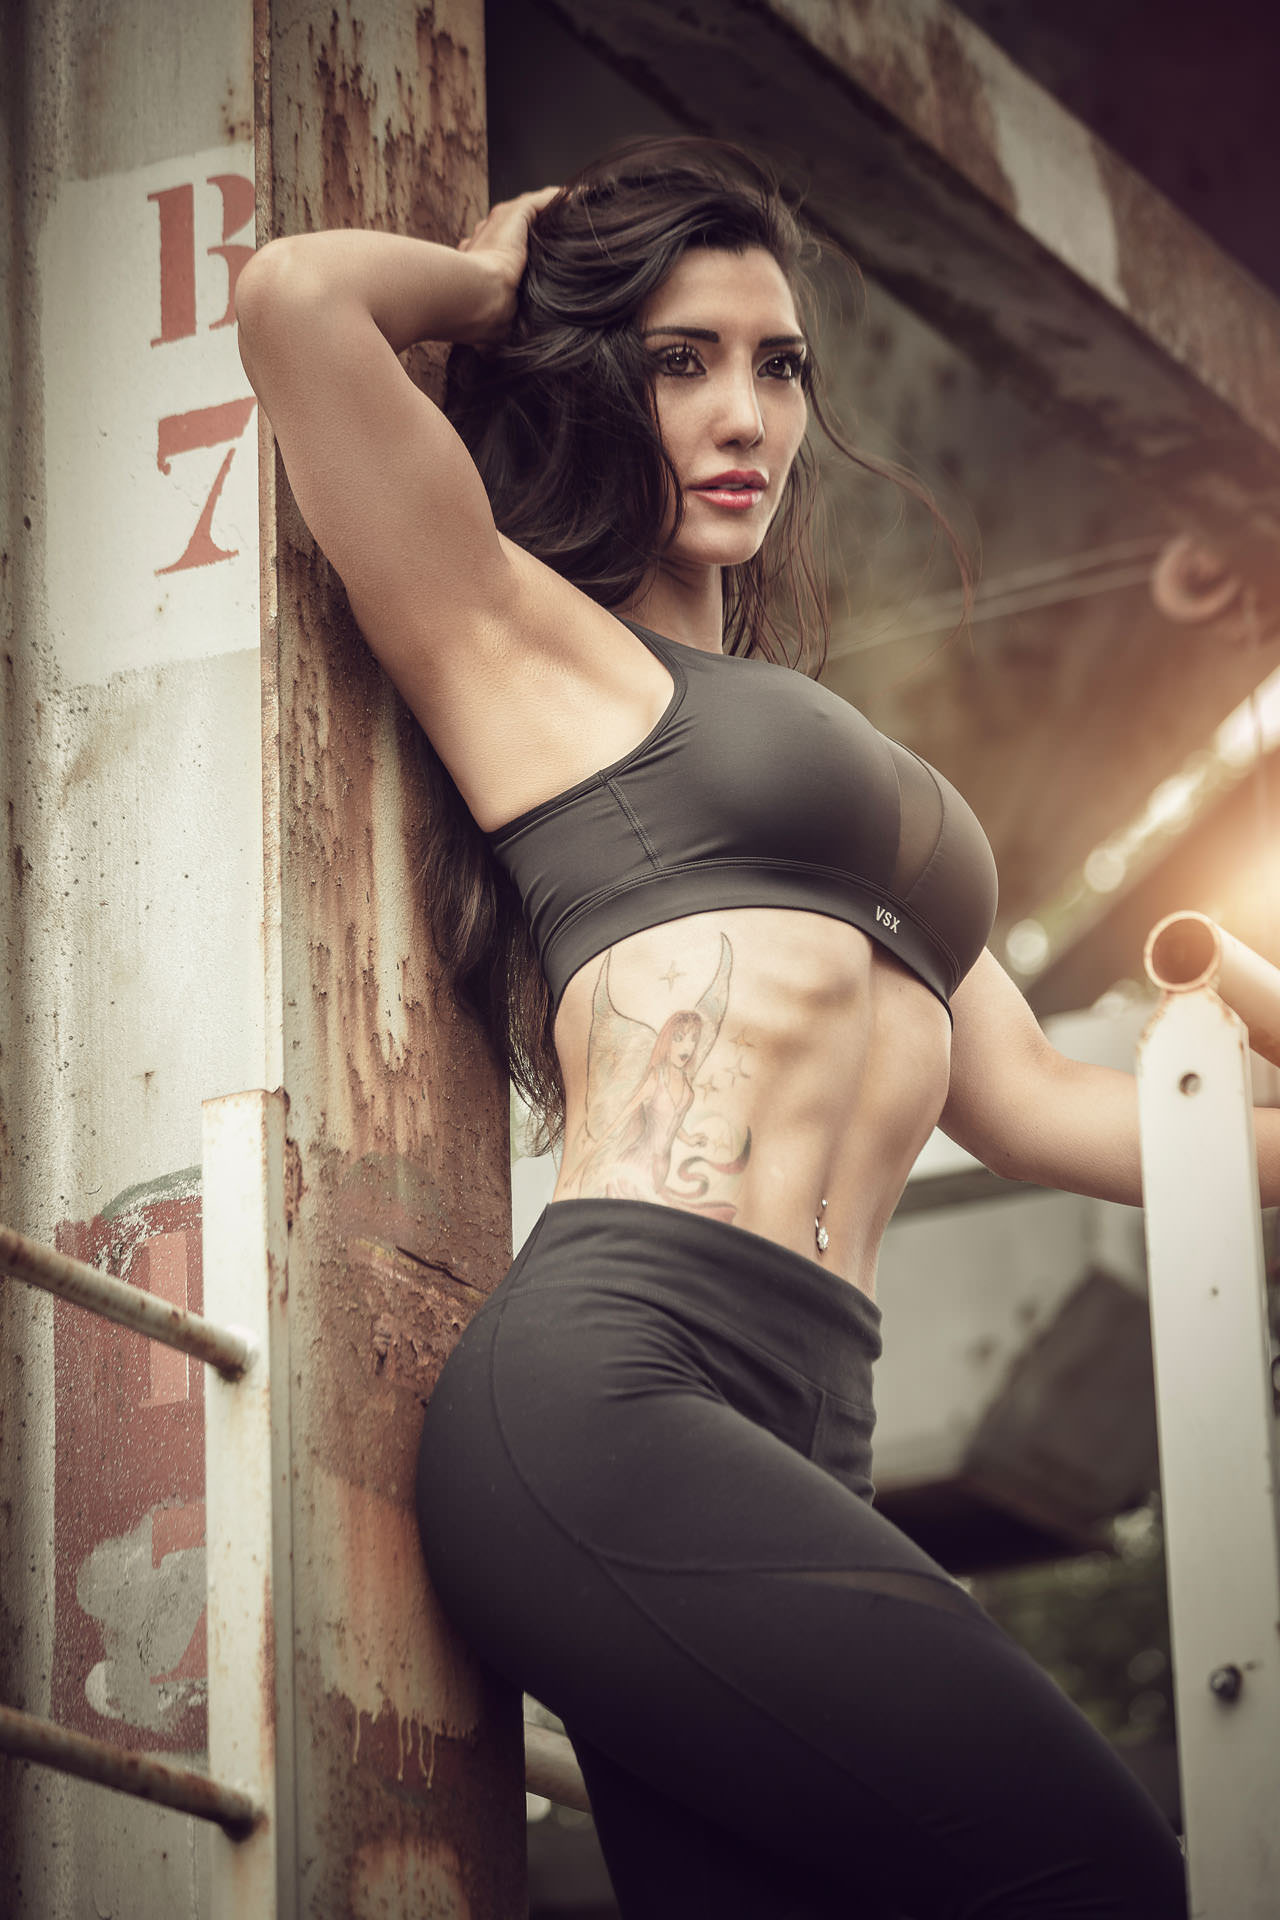 Gabrielle Friscira